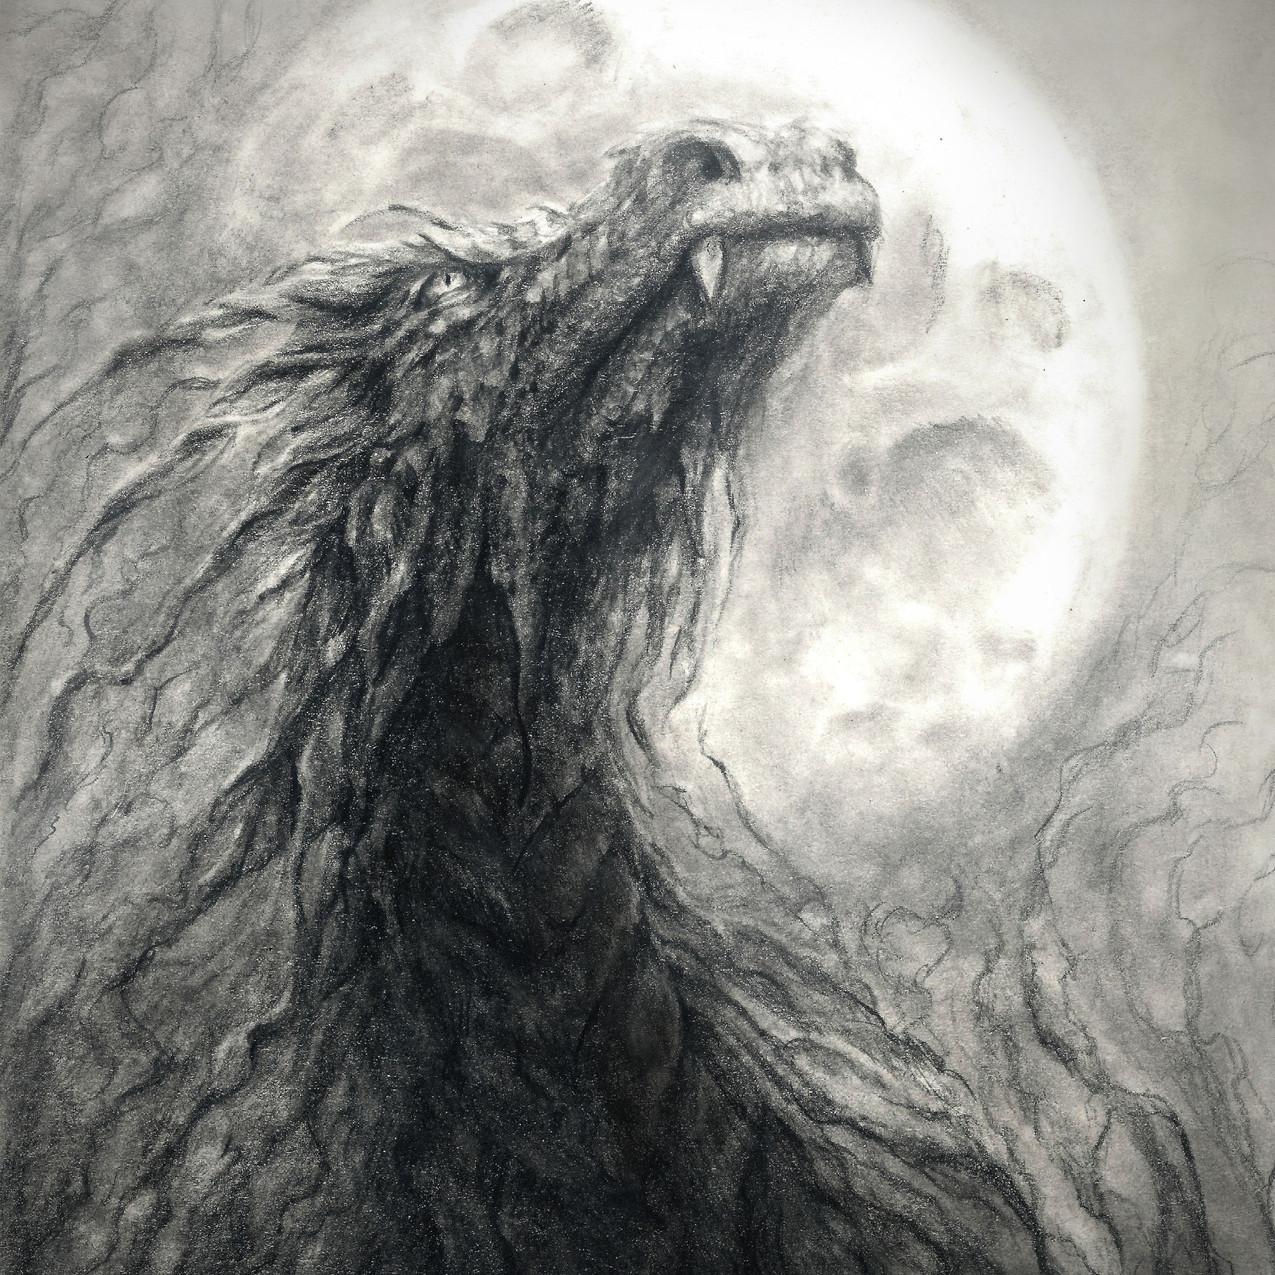 Thijs as a dragon